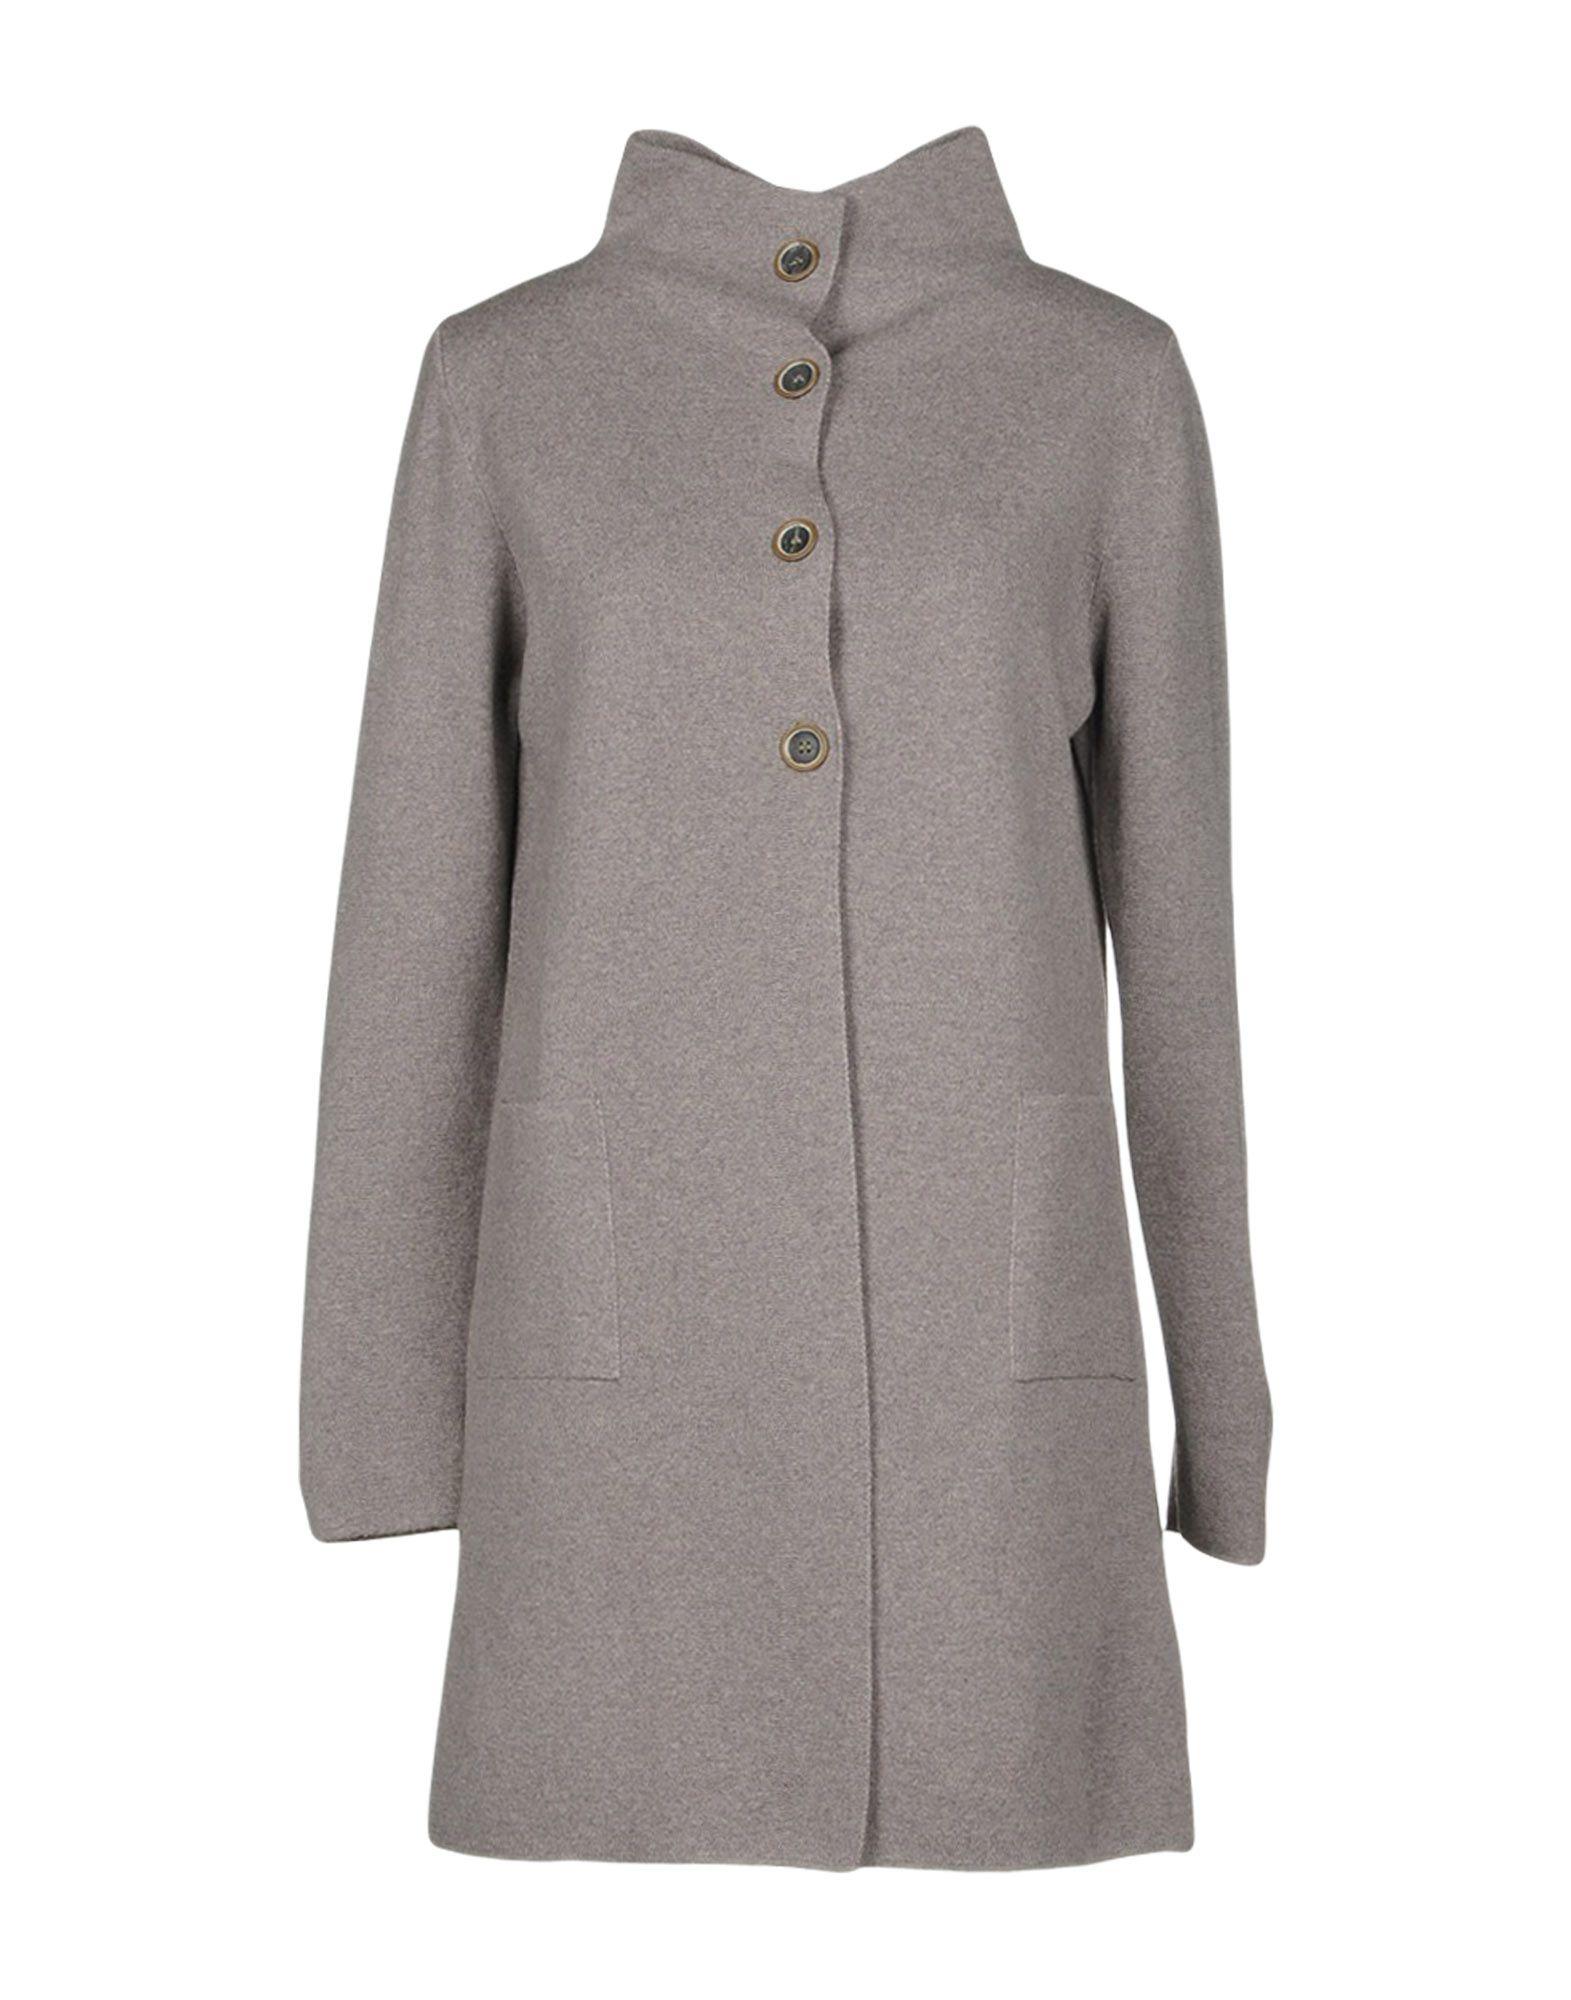 VENGERA Cardigan in Grey